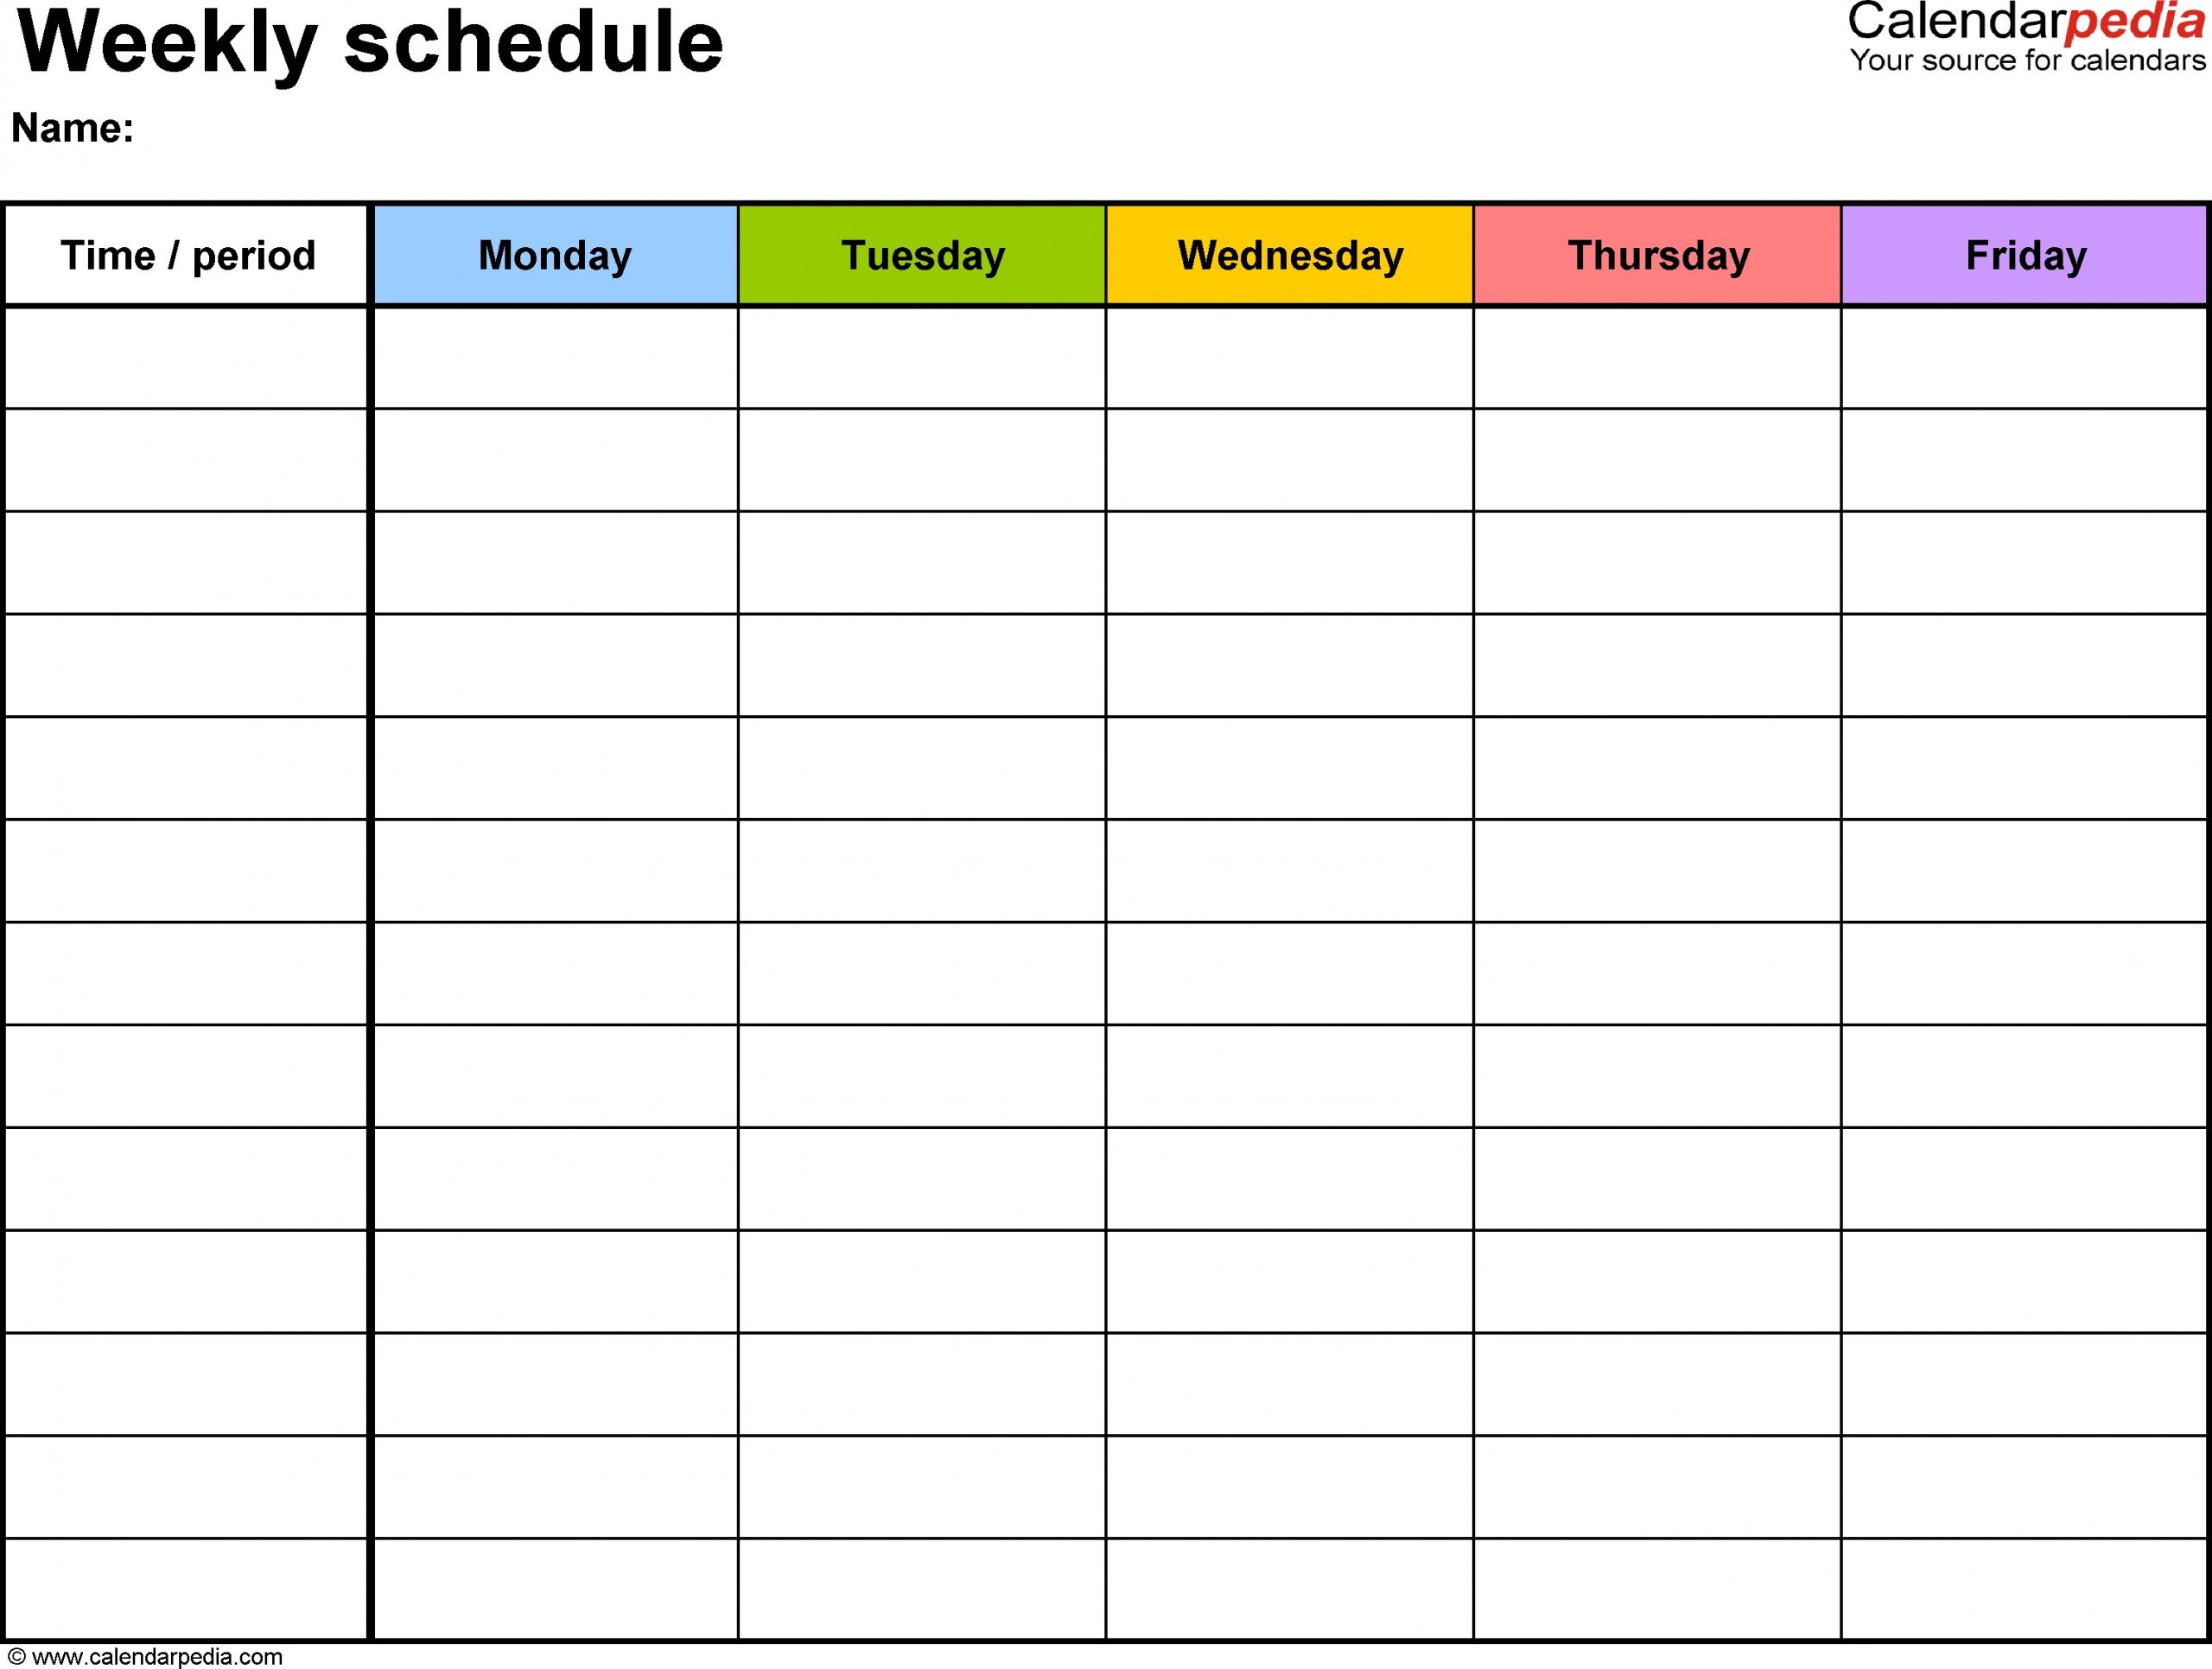 7 Day Calendar Template Excel | Free Calendar Template Example Calendar Template For 7 Days